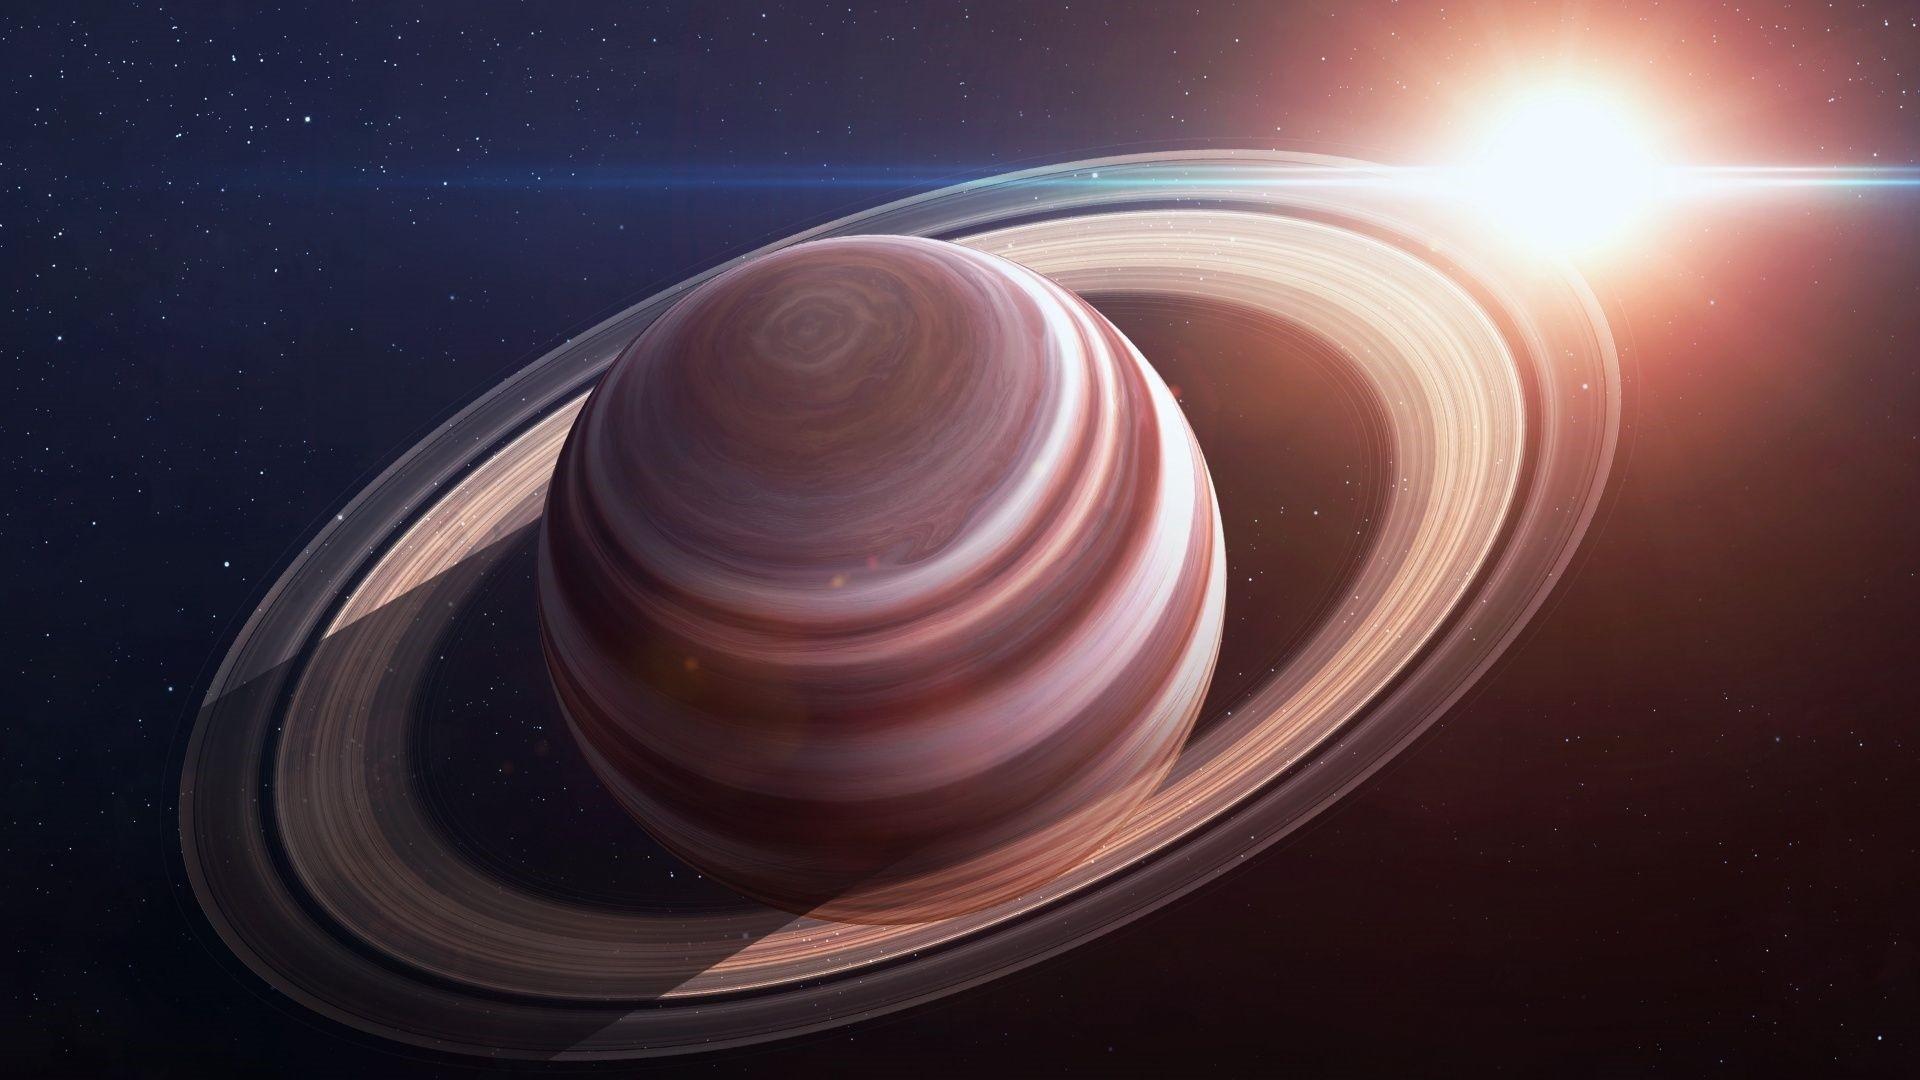 Saturn full screen hd wallpaper